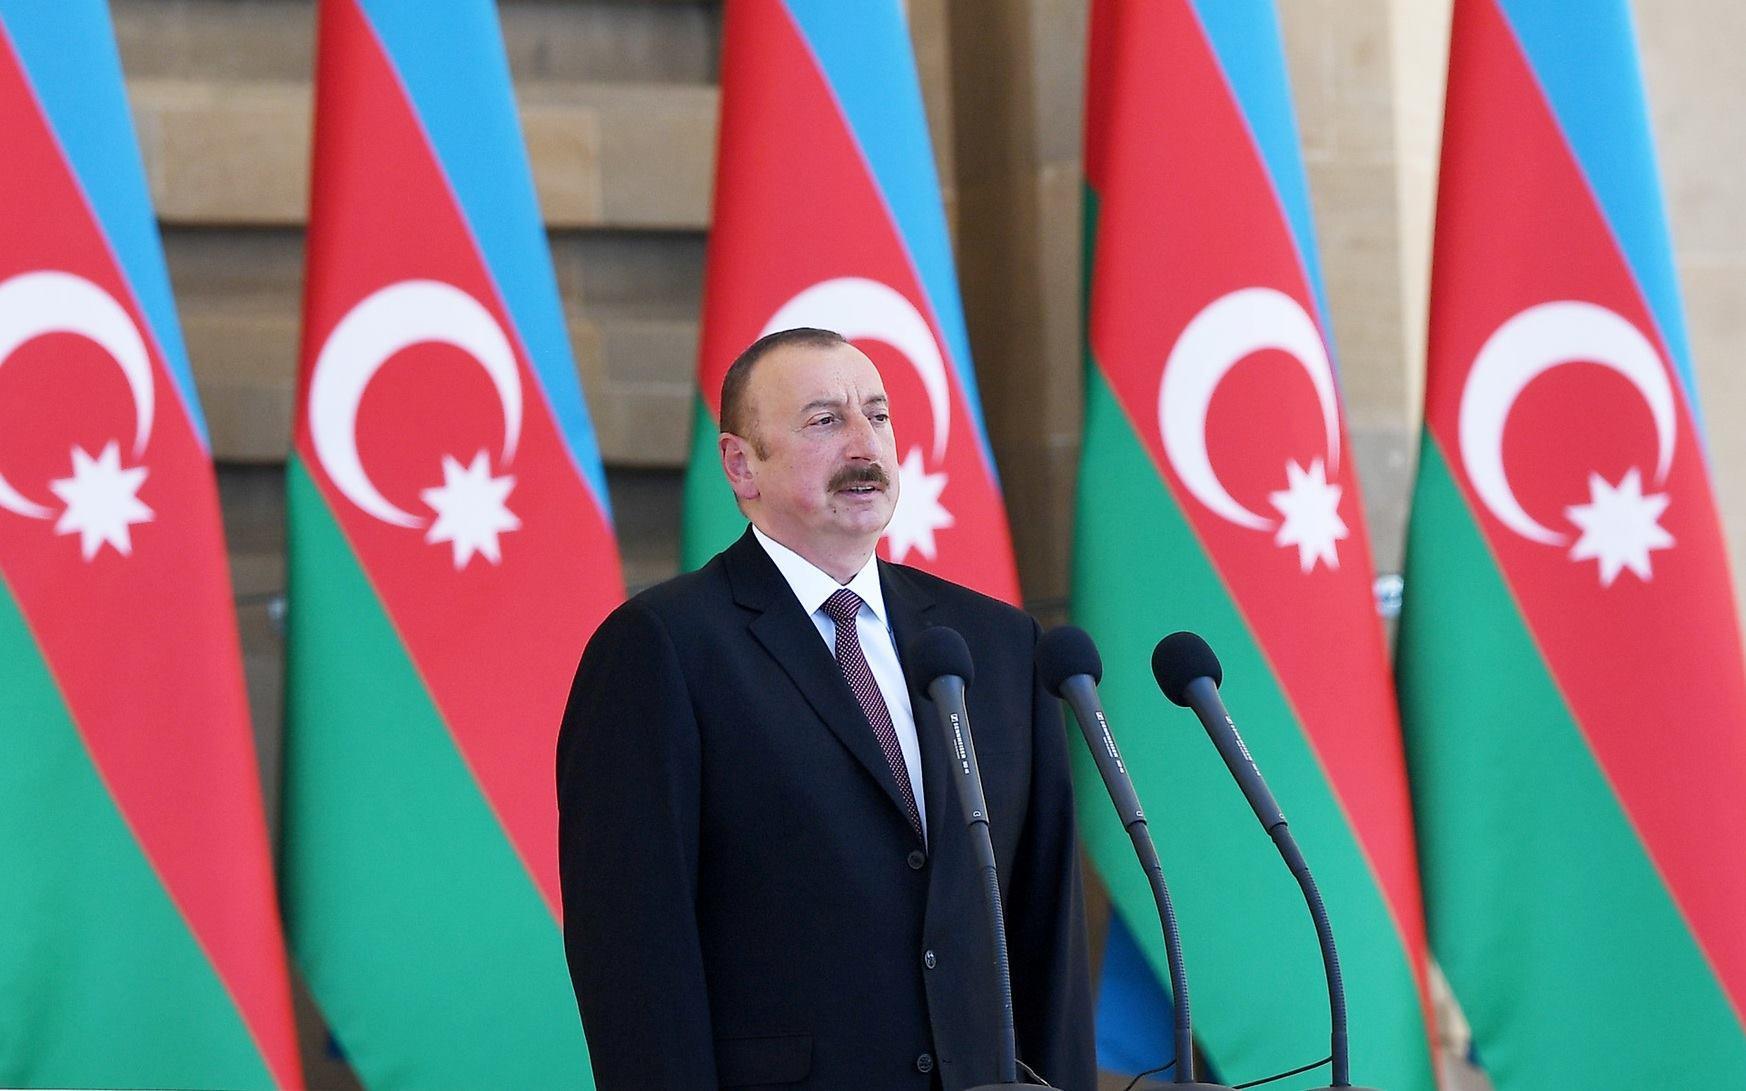 Алиев превратил Азербайджан в развитую страну - Питер Тейс